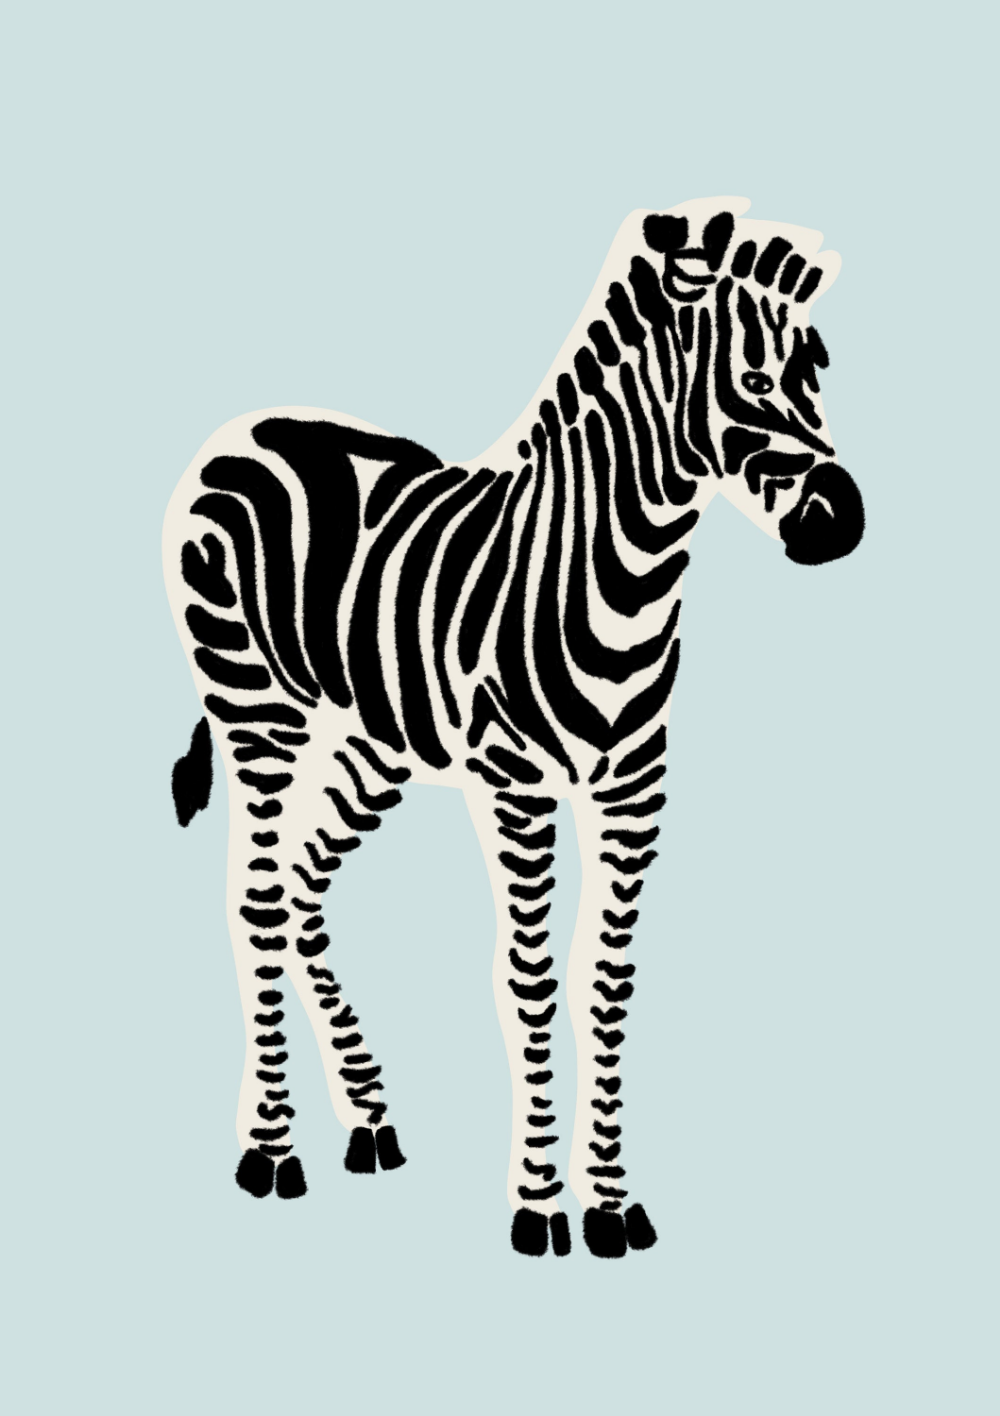 Zebra Pictures To Print